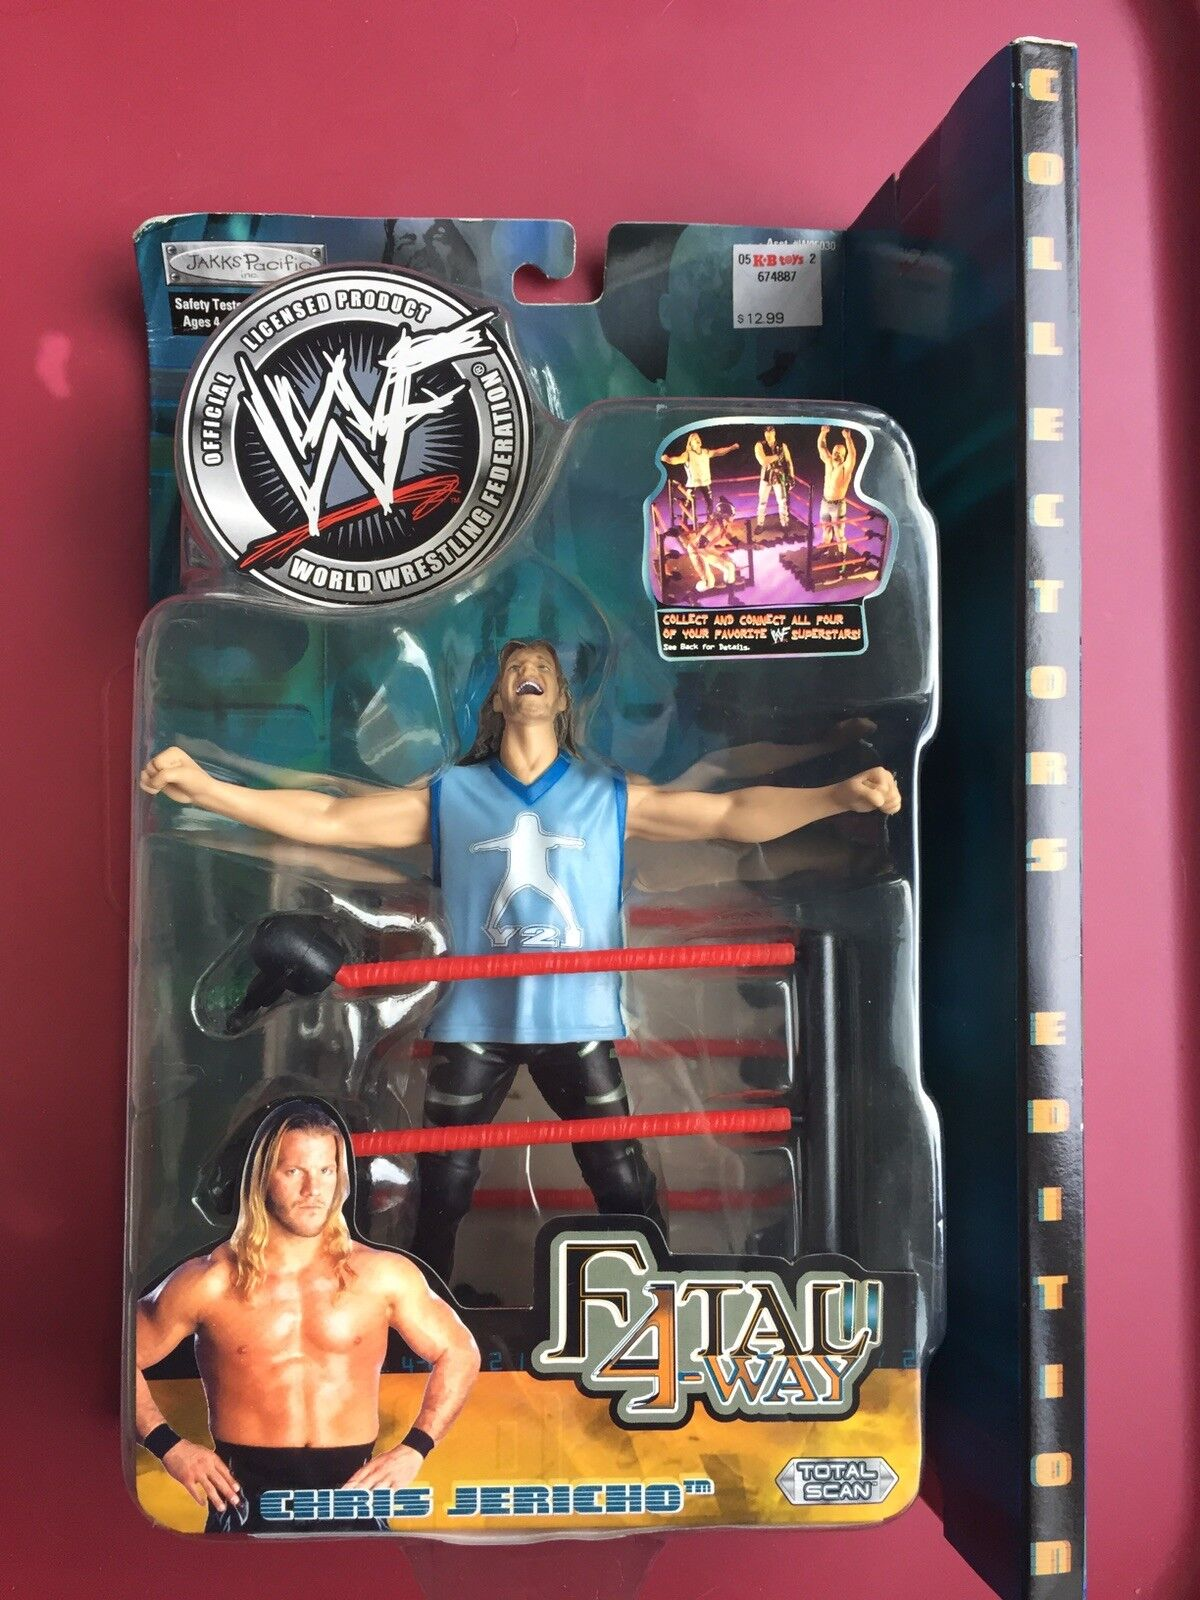 CHRIS JERICHO WWE WWF Jakks Pacific Toy Figure FATAL 4-WAY SERIES 2 NIB NRFB